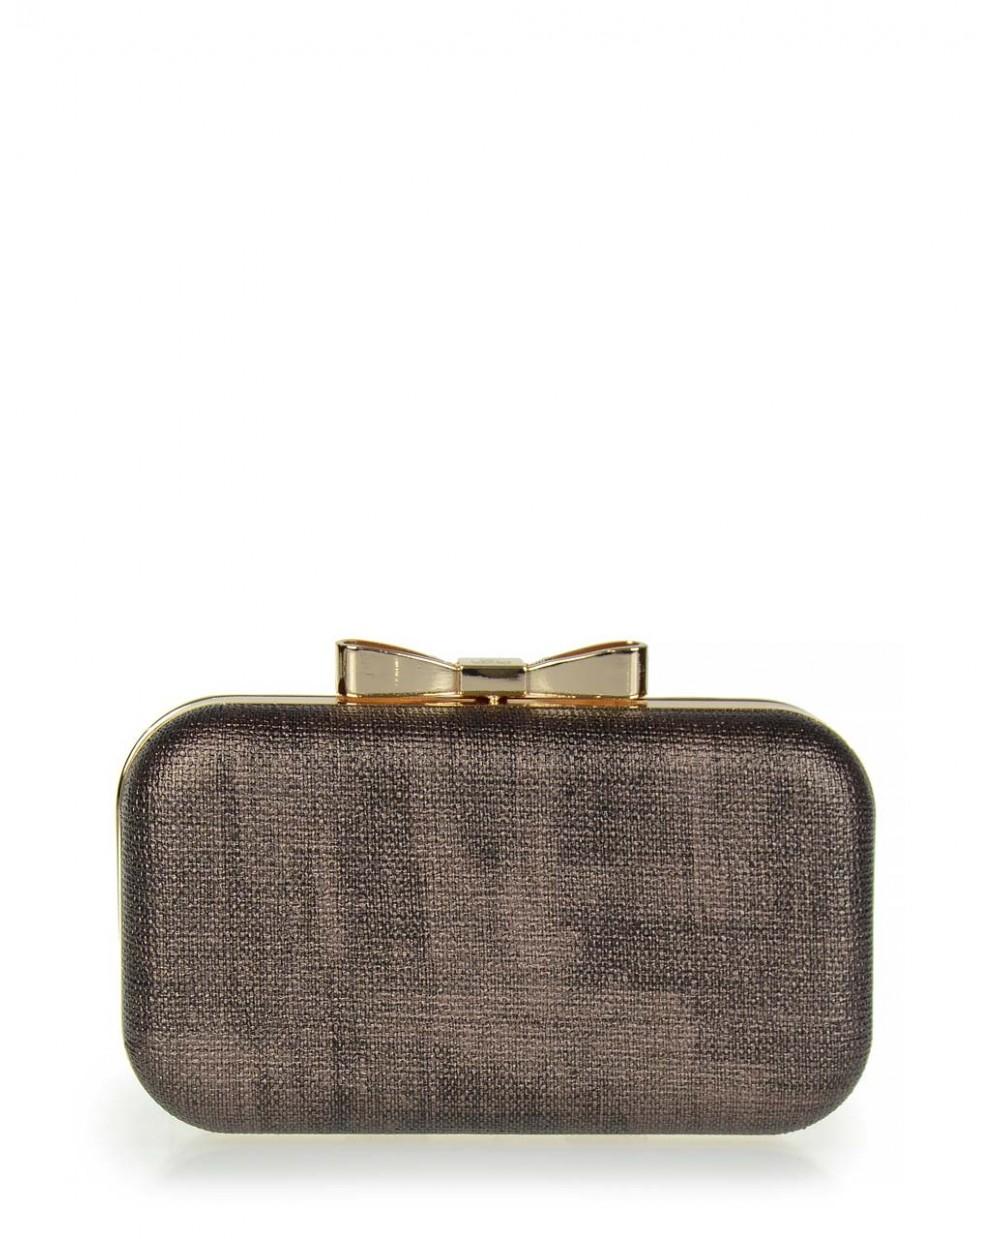 CLUTCH BAG 4006